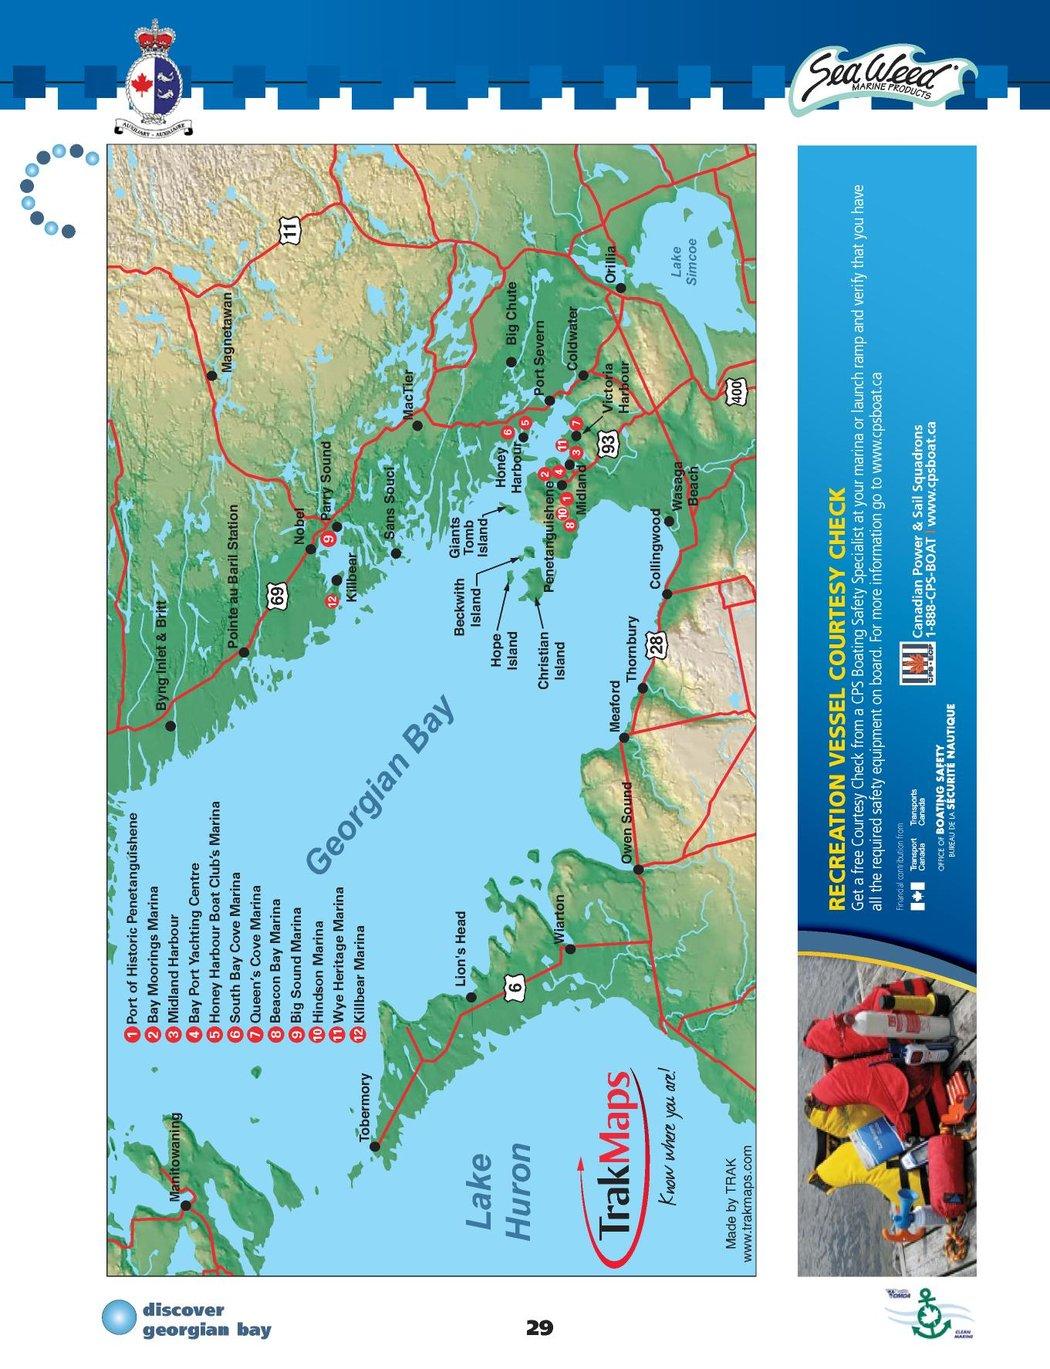 Georgian Bay - The North Channel & Manitoulin Island 2011 on nottawasaga bay, muskoka map, mobile bay map, bay of fundy map, honey harbour map, queen's university map, great lakes map, thunder bay district map, lake huron, lake michigan-huron, windsor map, montreal map, ontario map, wasaga beach map, waterton lakes national park map, georgian bay, ontario, ottawa river map, thunder bay, village at blue map, powassan map, french river, bruce peninsula map, bay of quinte map, quebec city map, lake nipissing, straits of mackinac, bay of islands map, st. john's map,